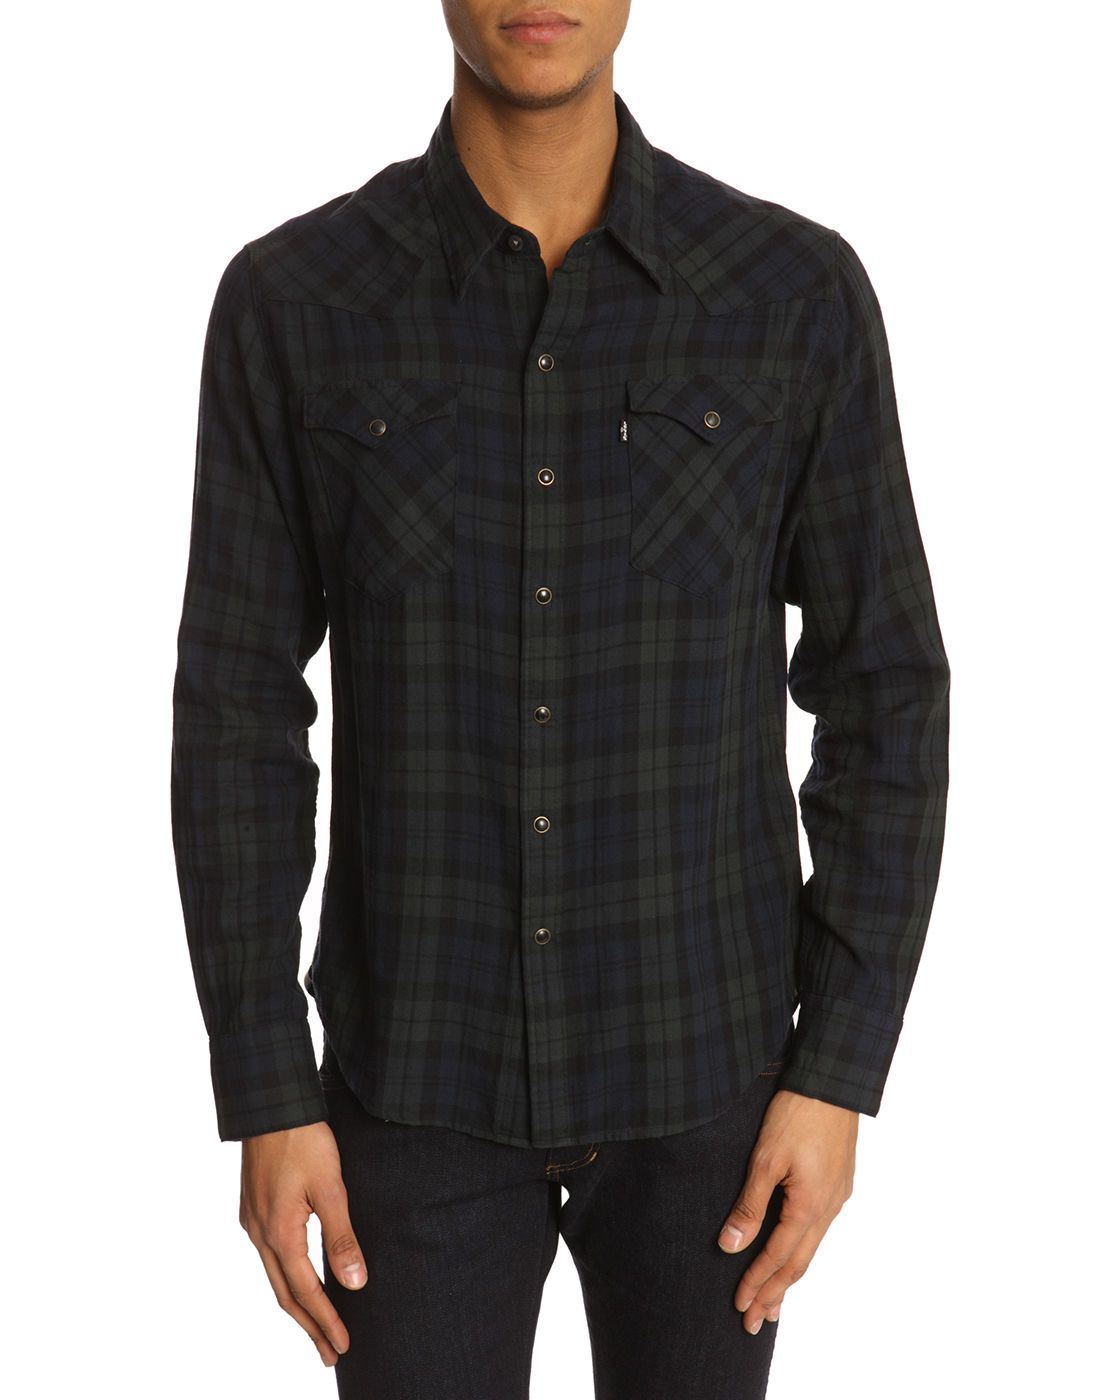 Blue and Green Tartan Shirt by LEVI'S — £65.57